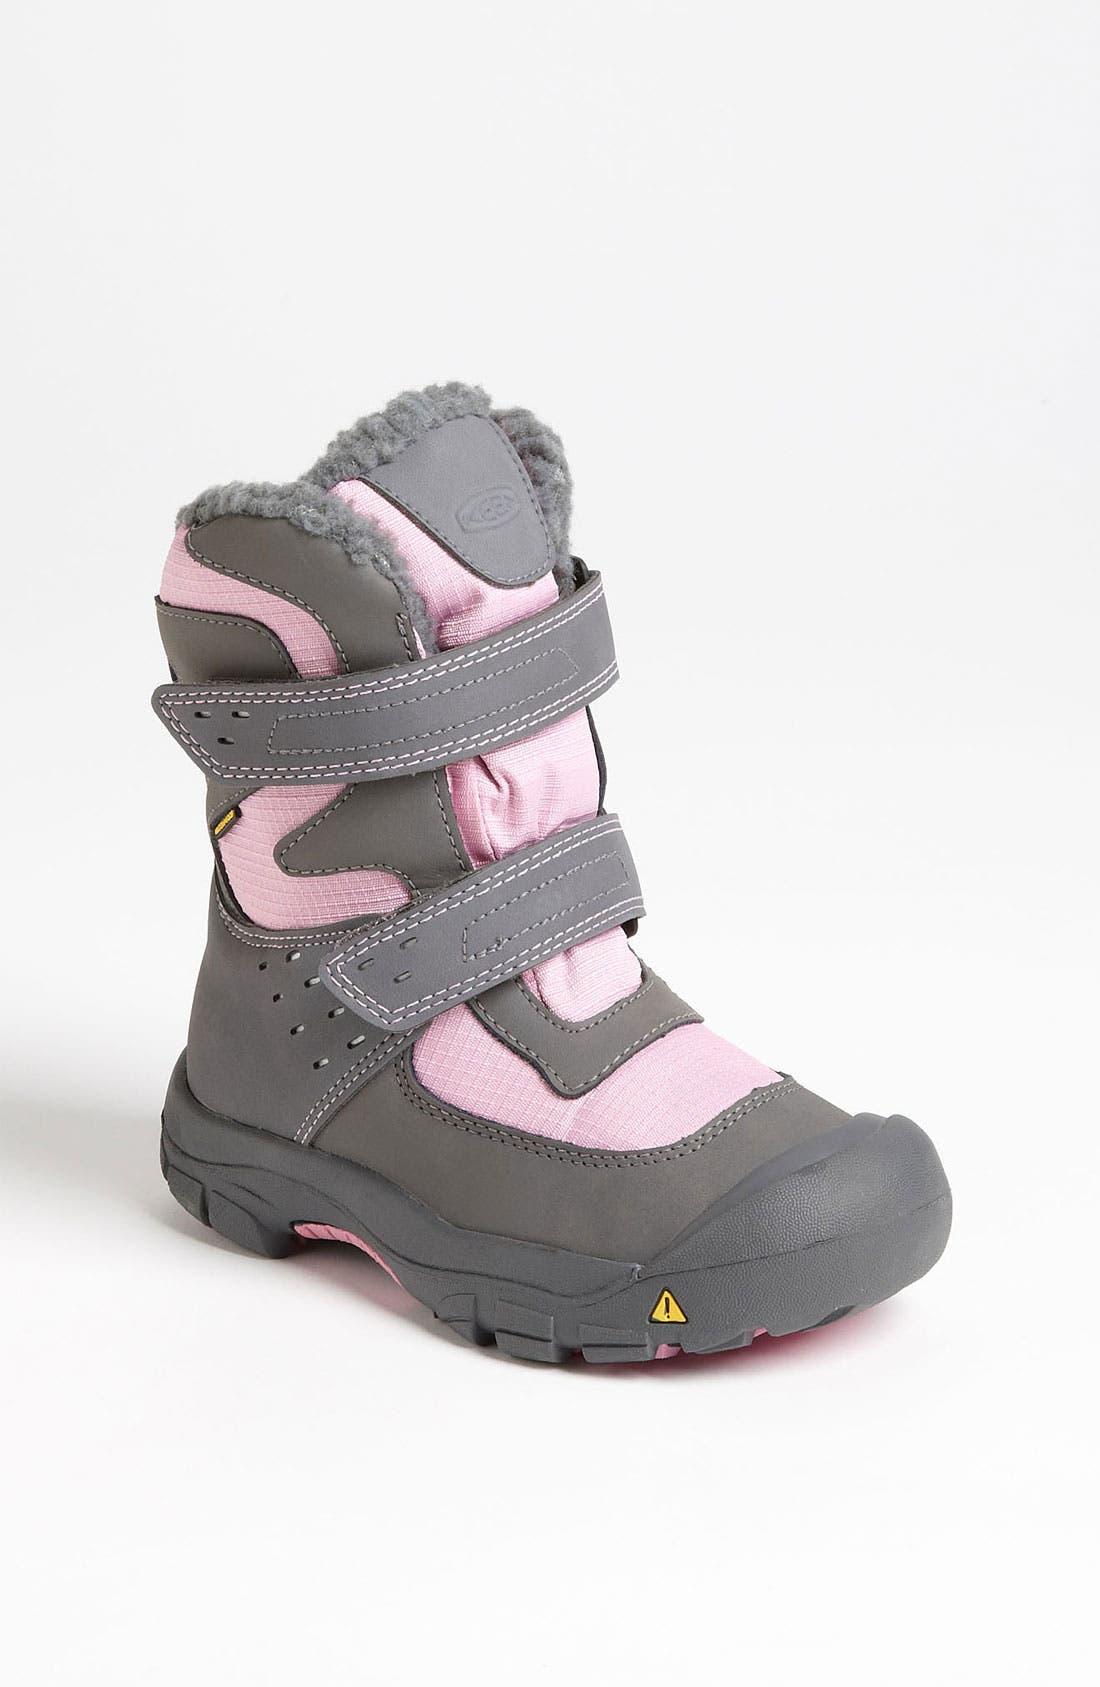 Alternate Image 1 Selected - Keen 'Kalamazoo' Snow Boot (Toddler, Little Kid & Big Kid)